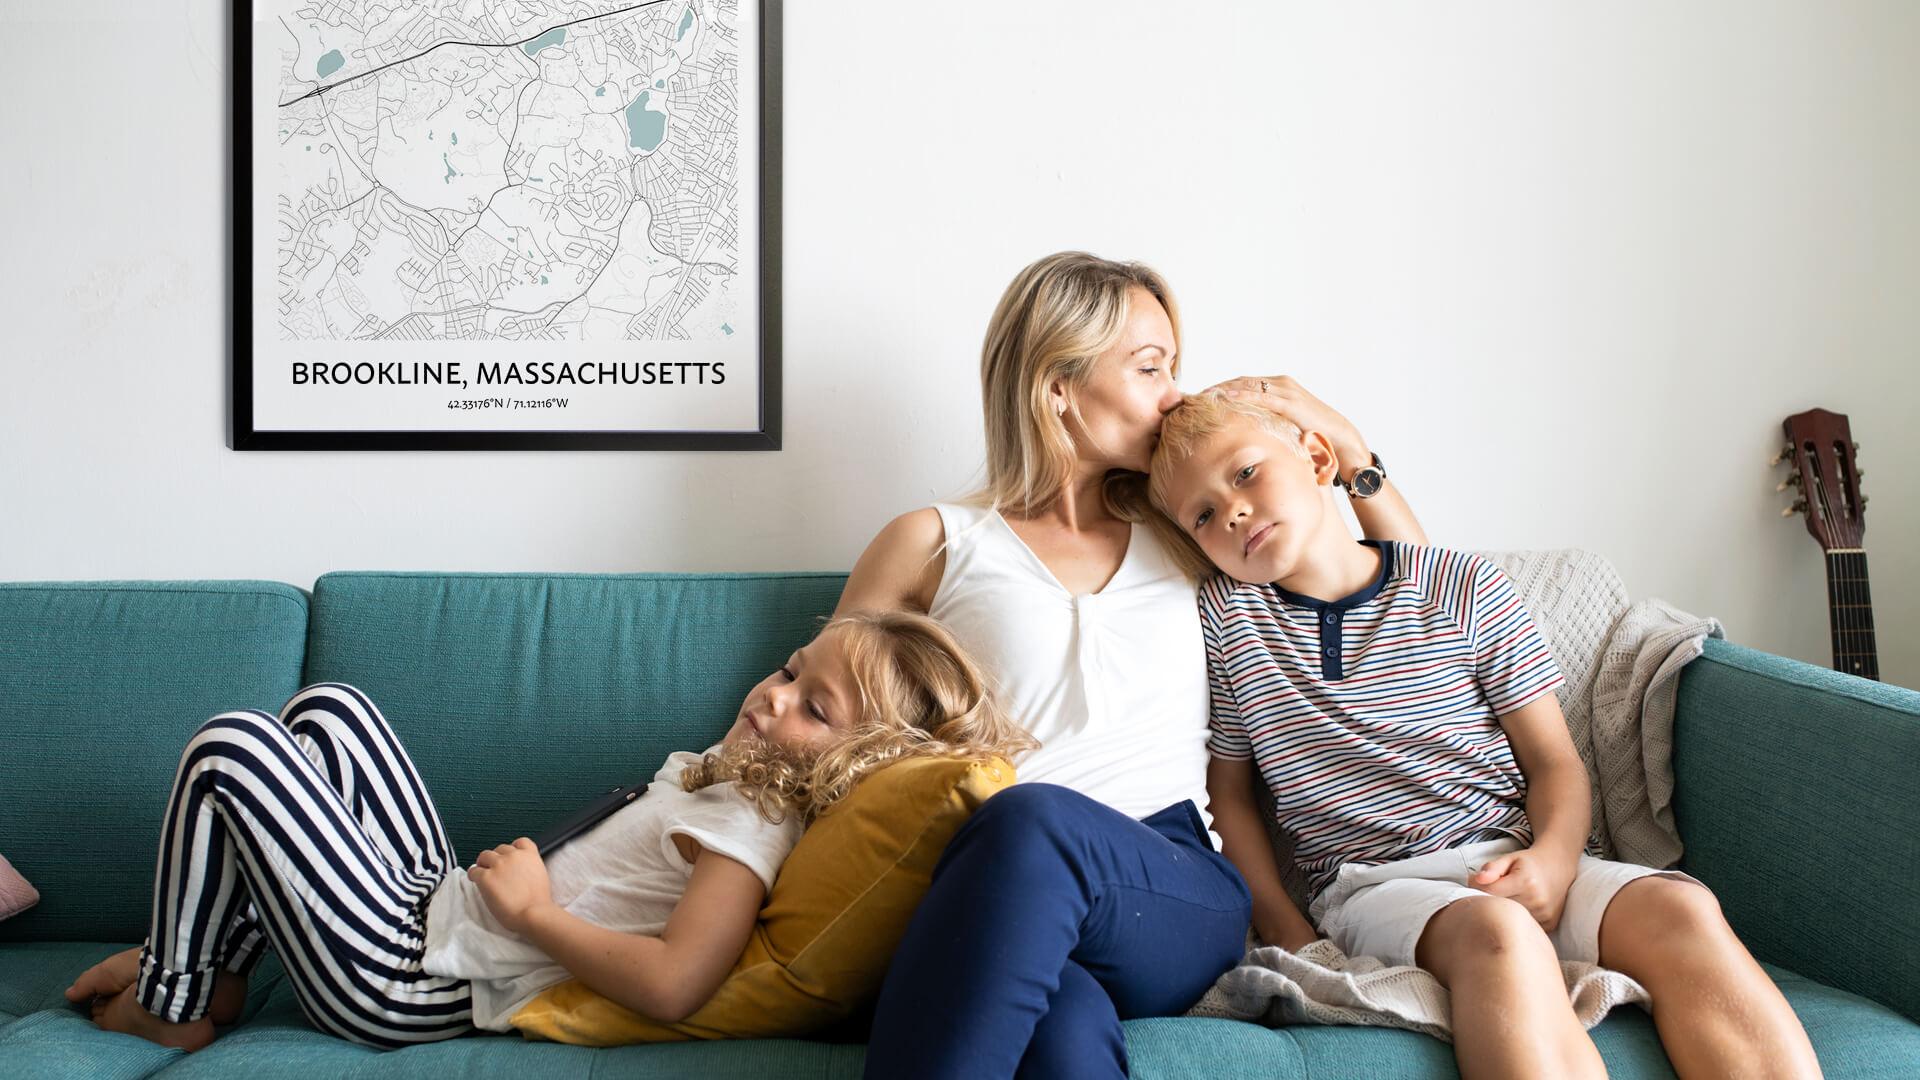 Brookline map poster